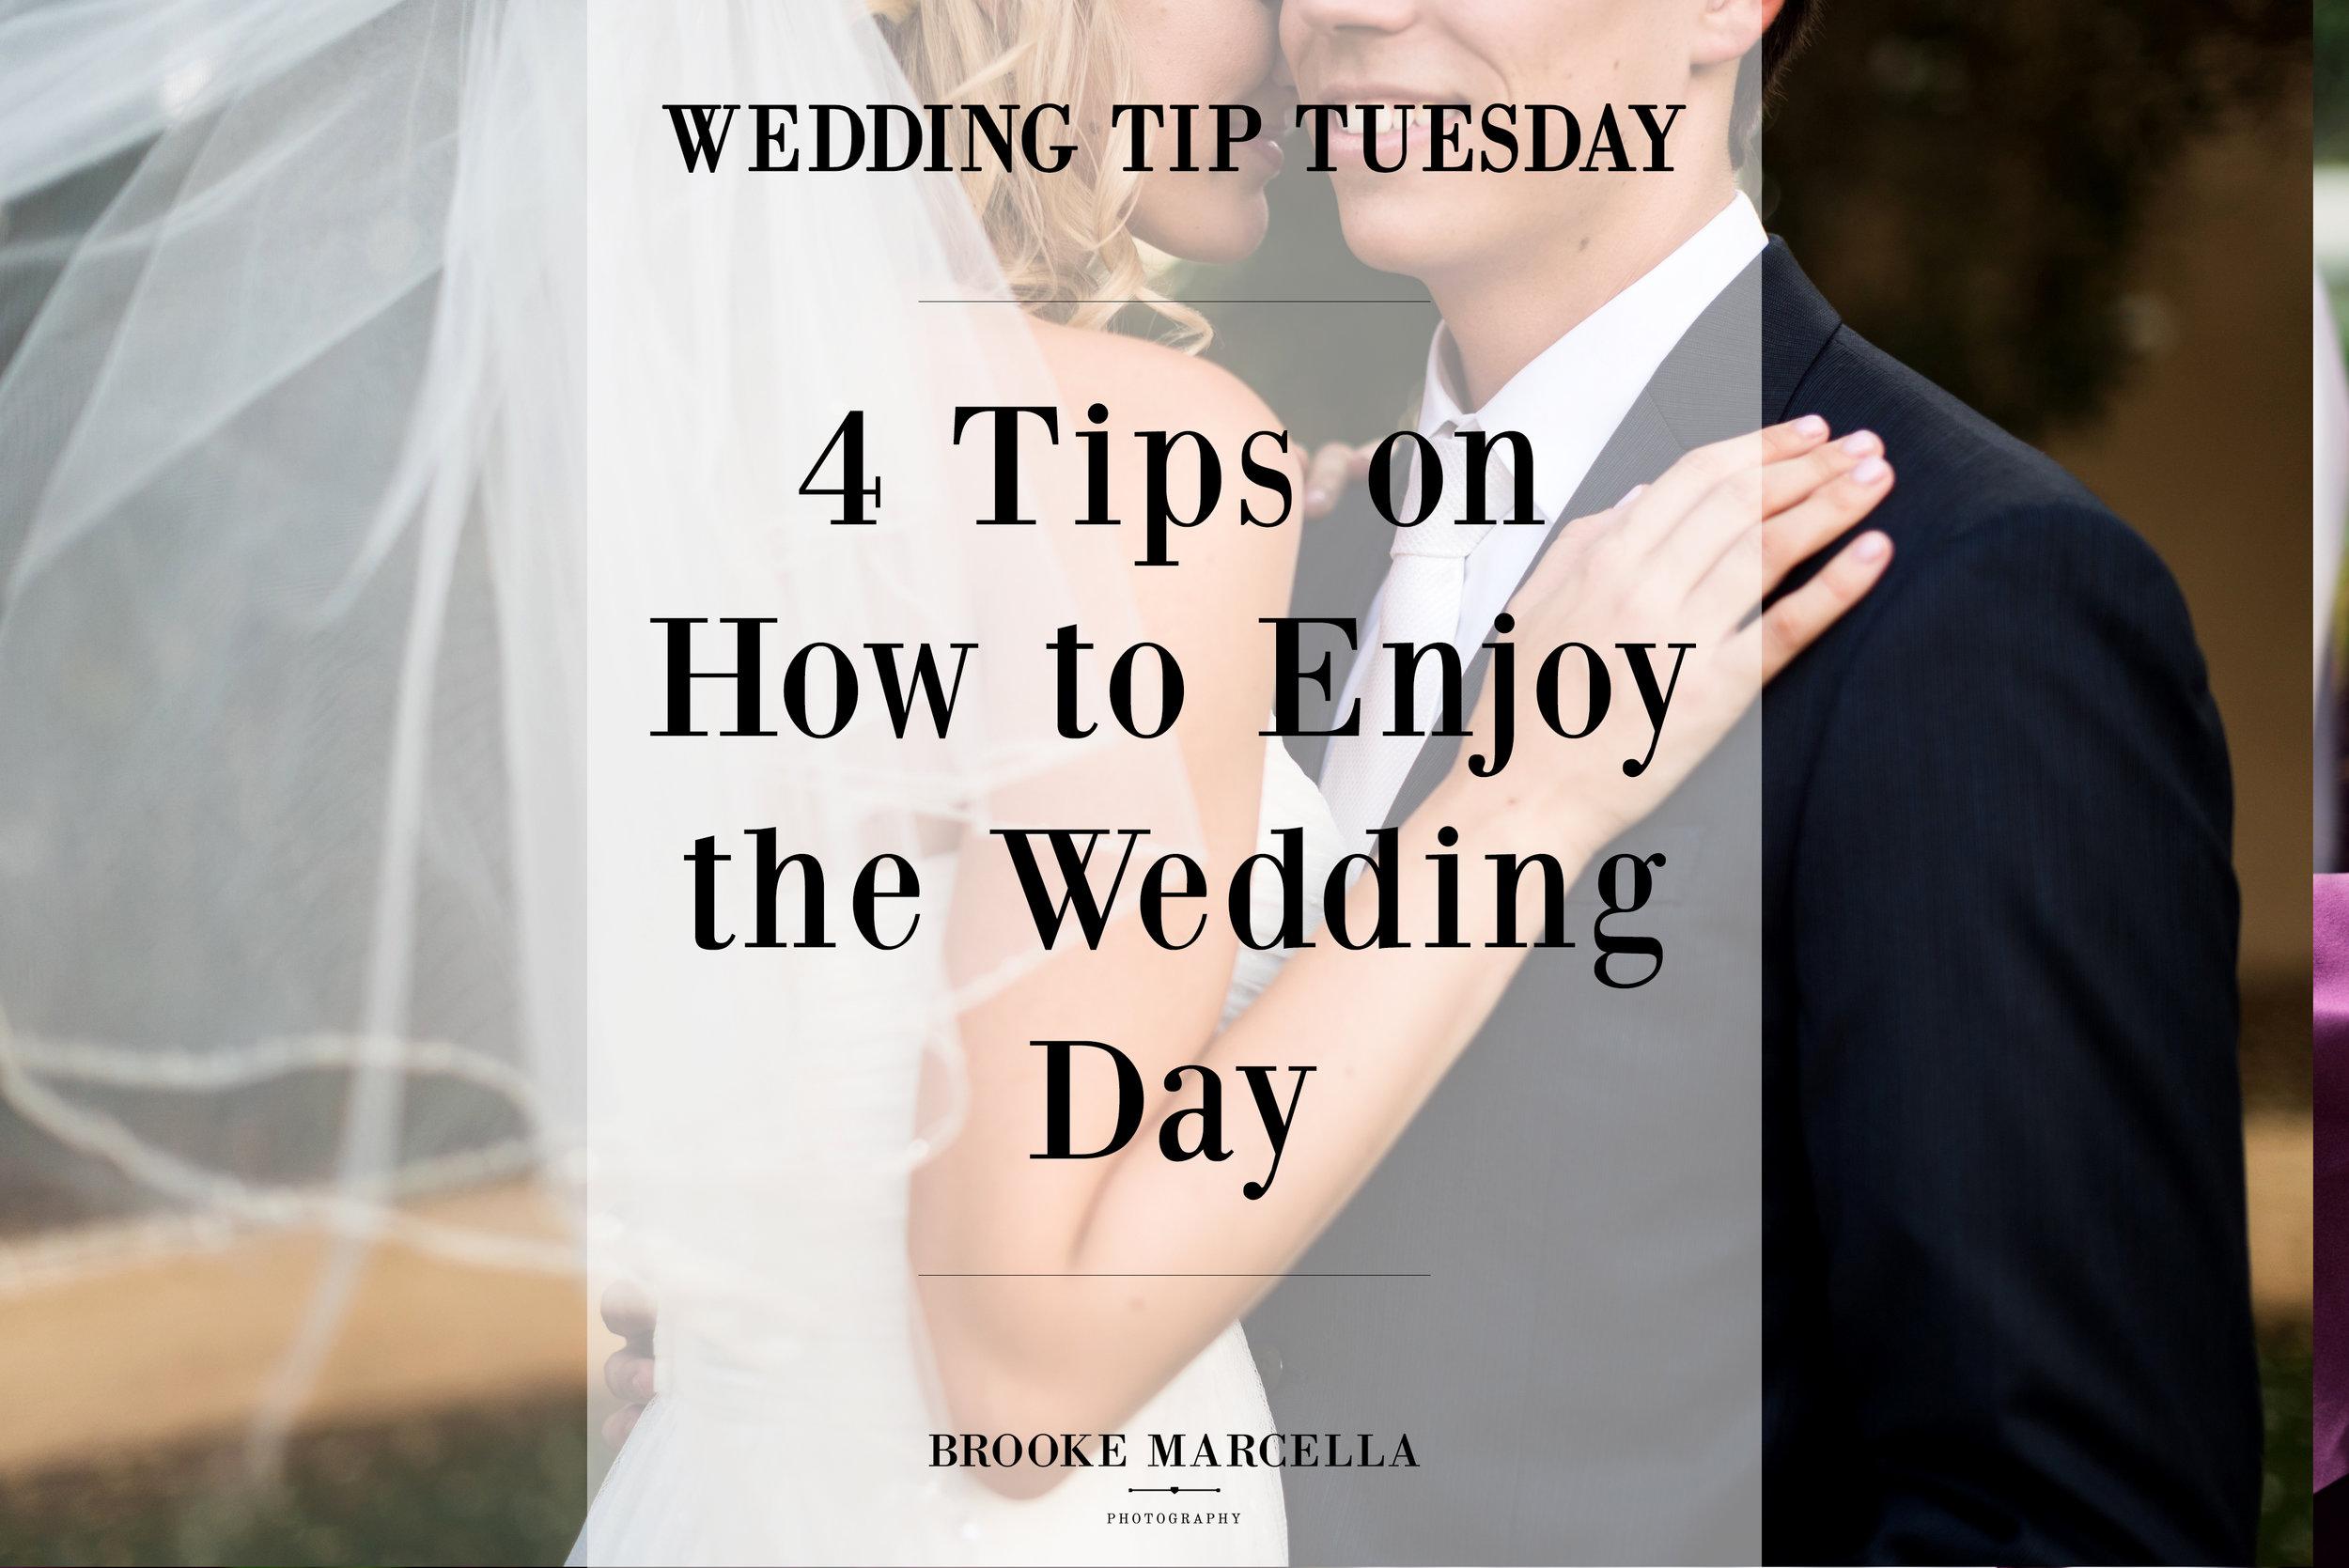 4 Tips to Enjoy your Wedding Day | Wedding Tip Tuesday